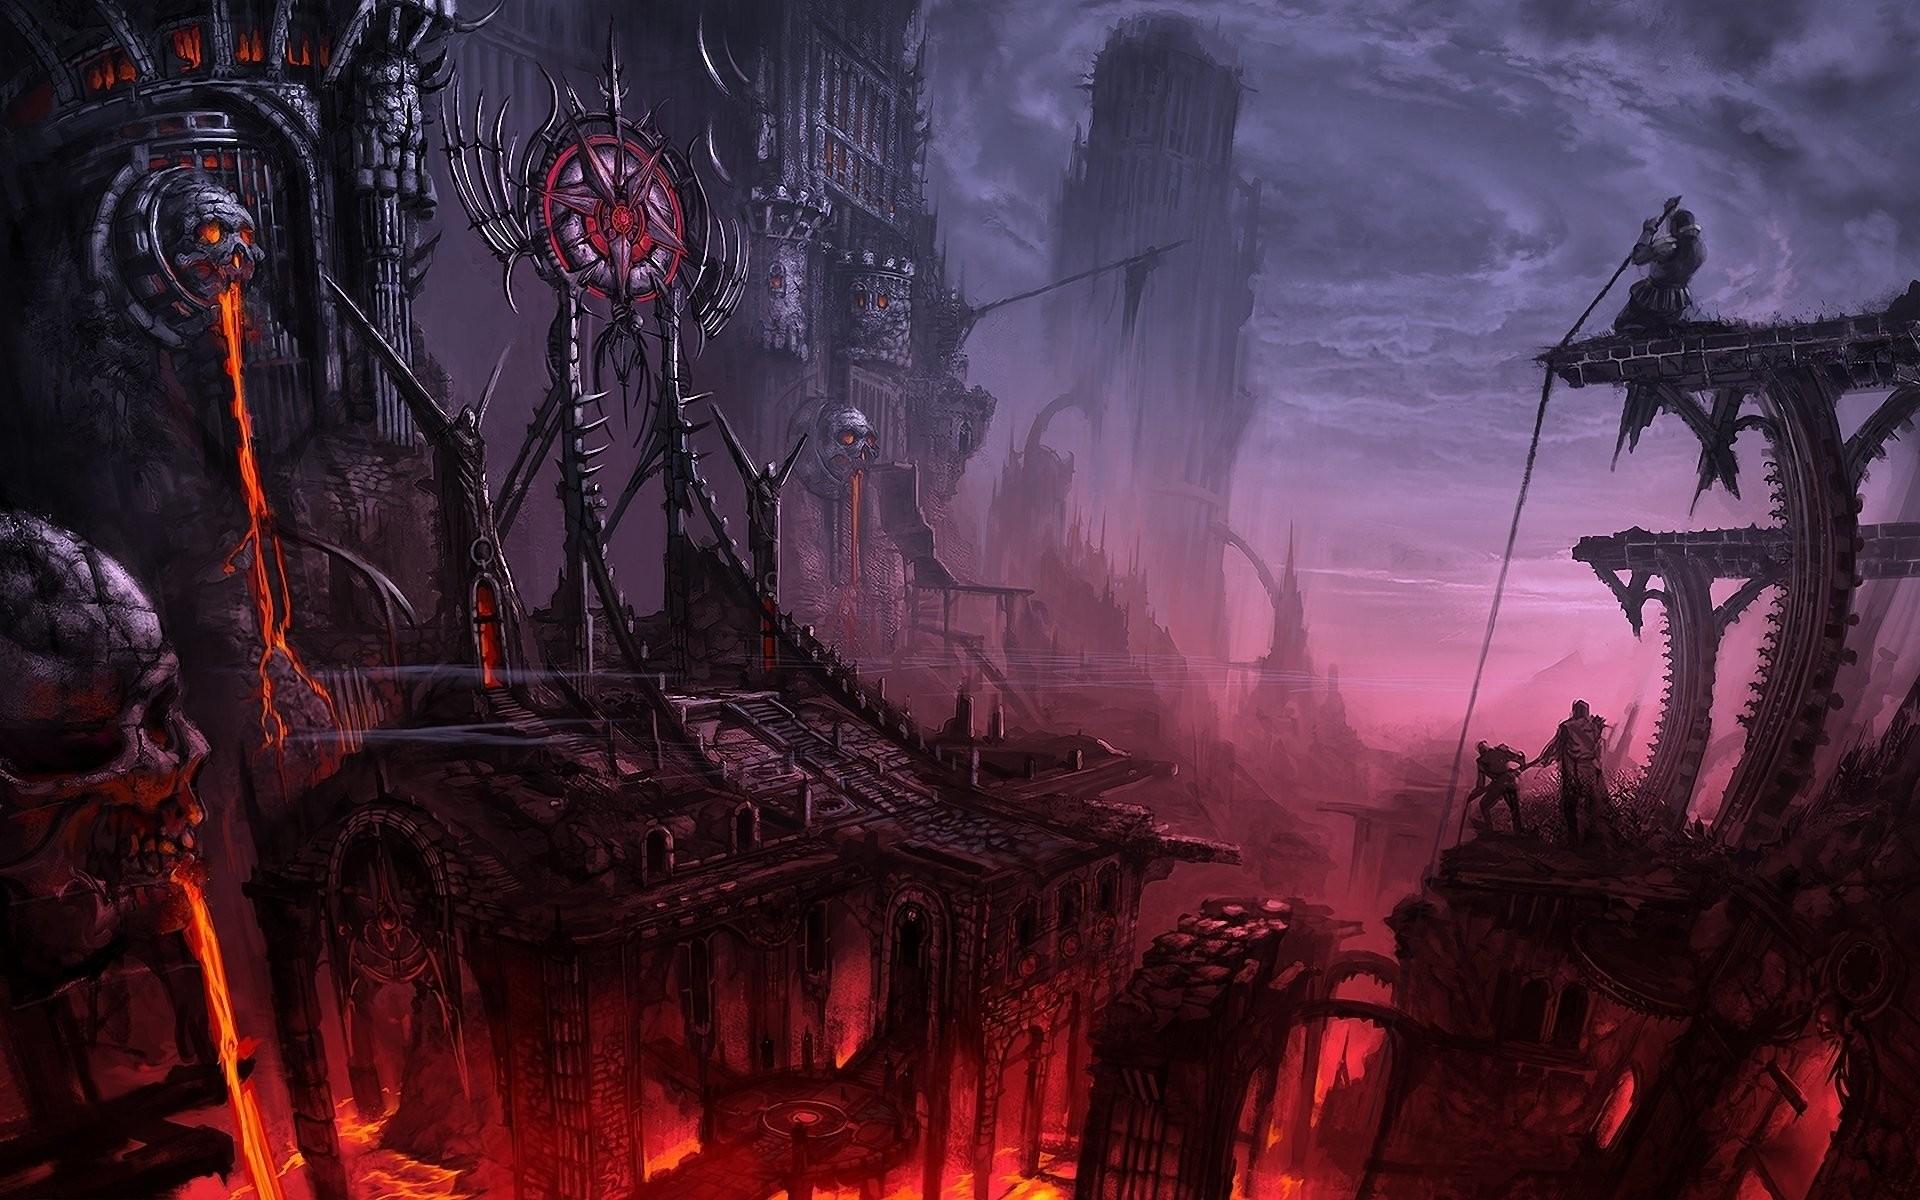 Dark Fantasy Wallpapers 72 Pictures